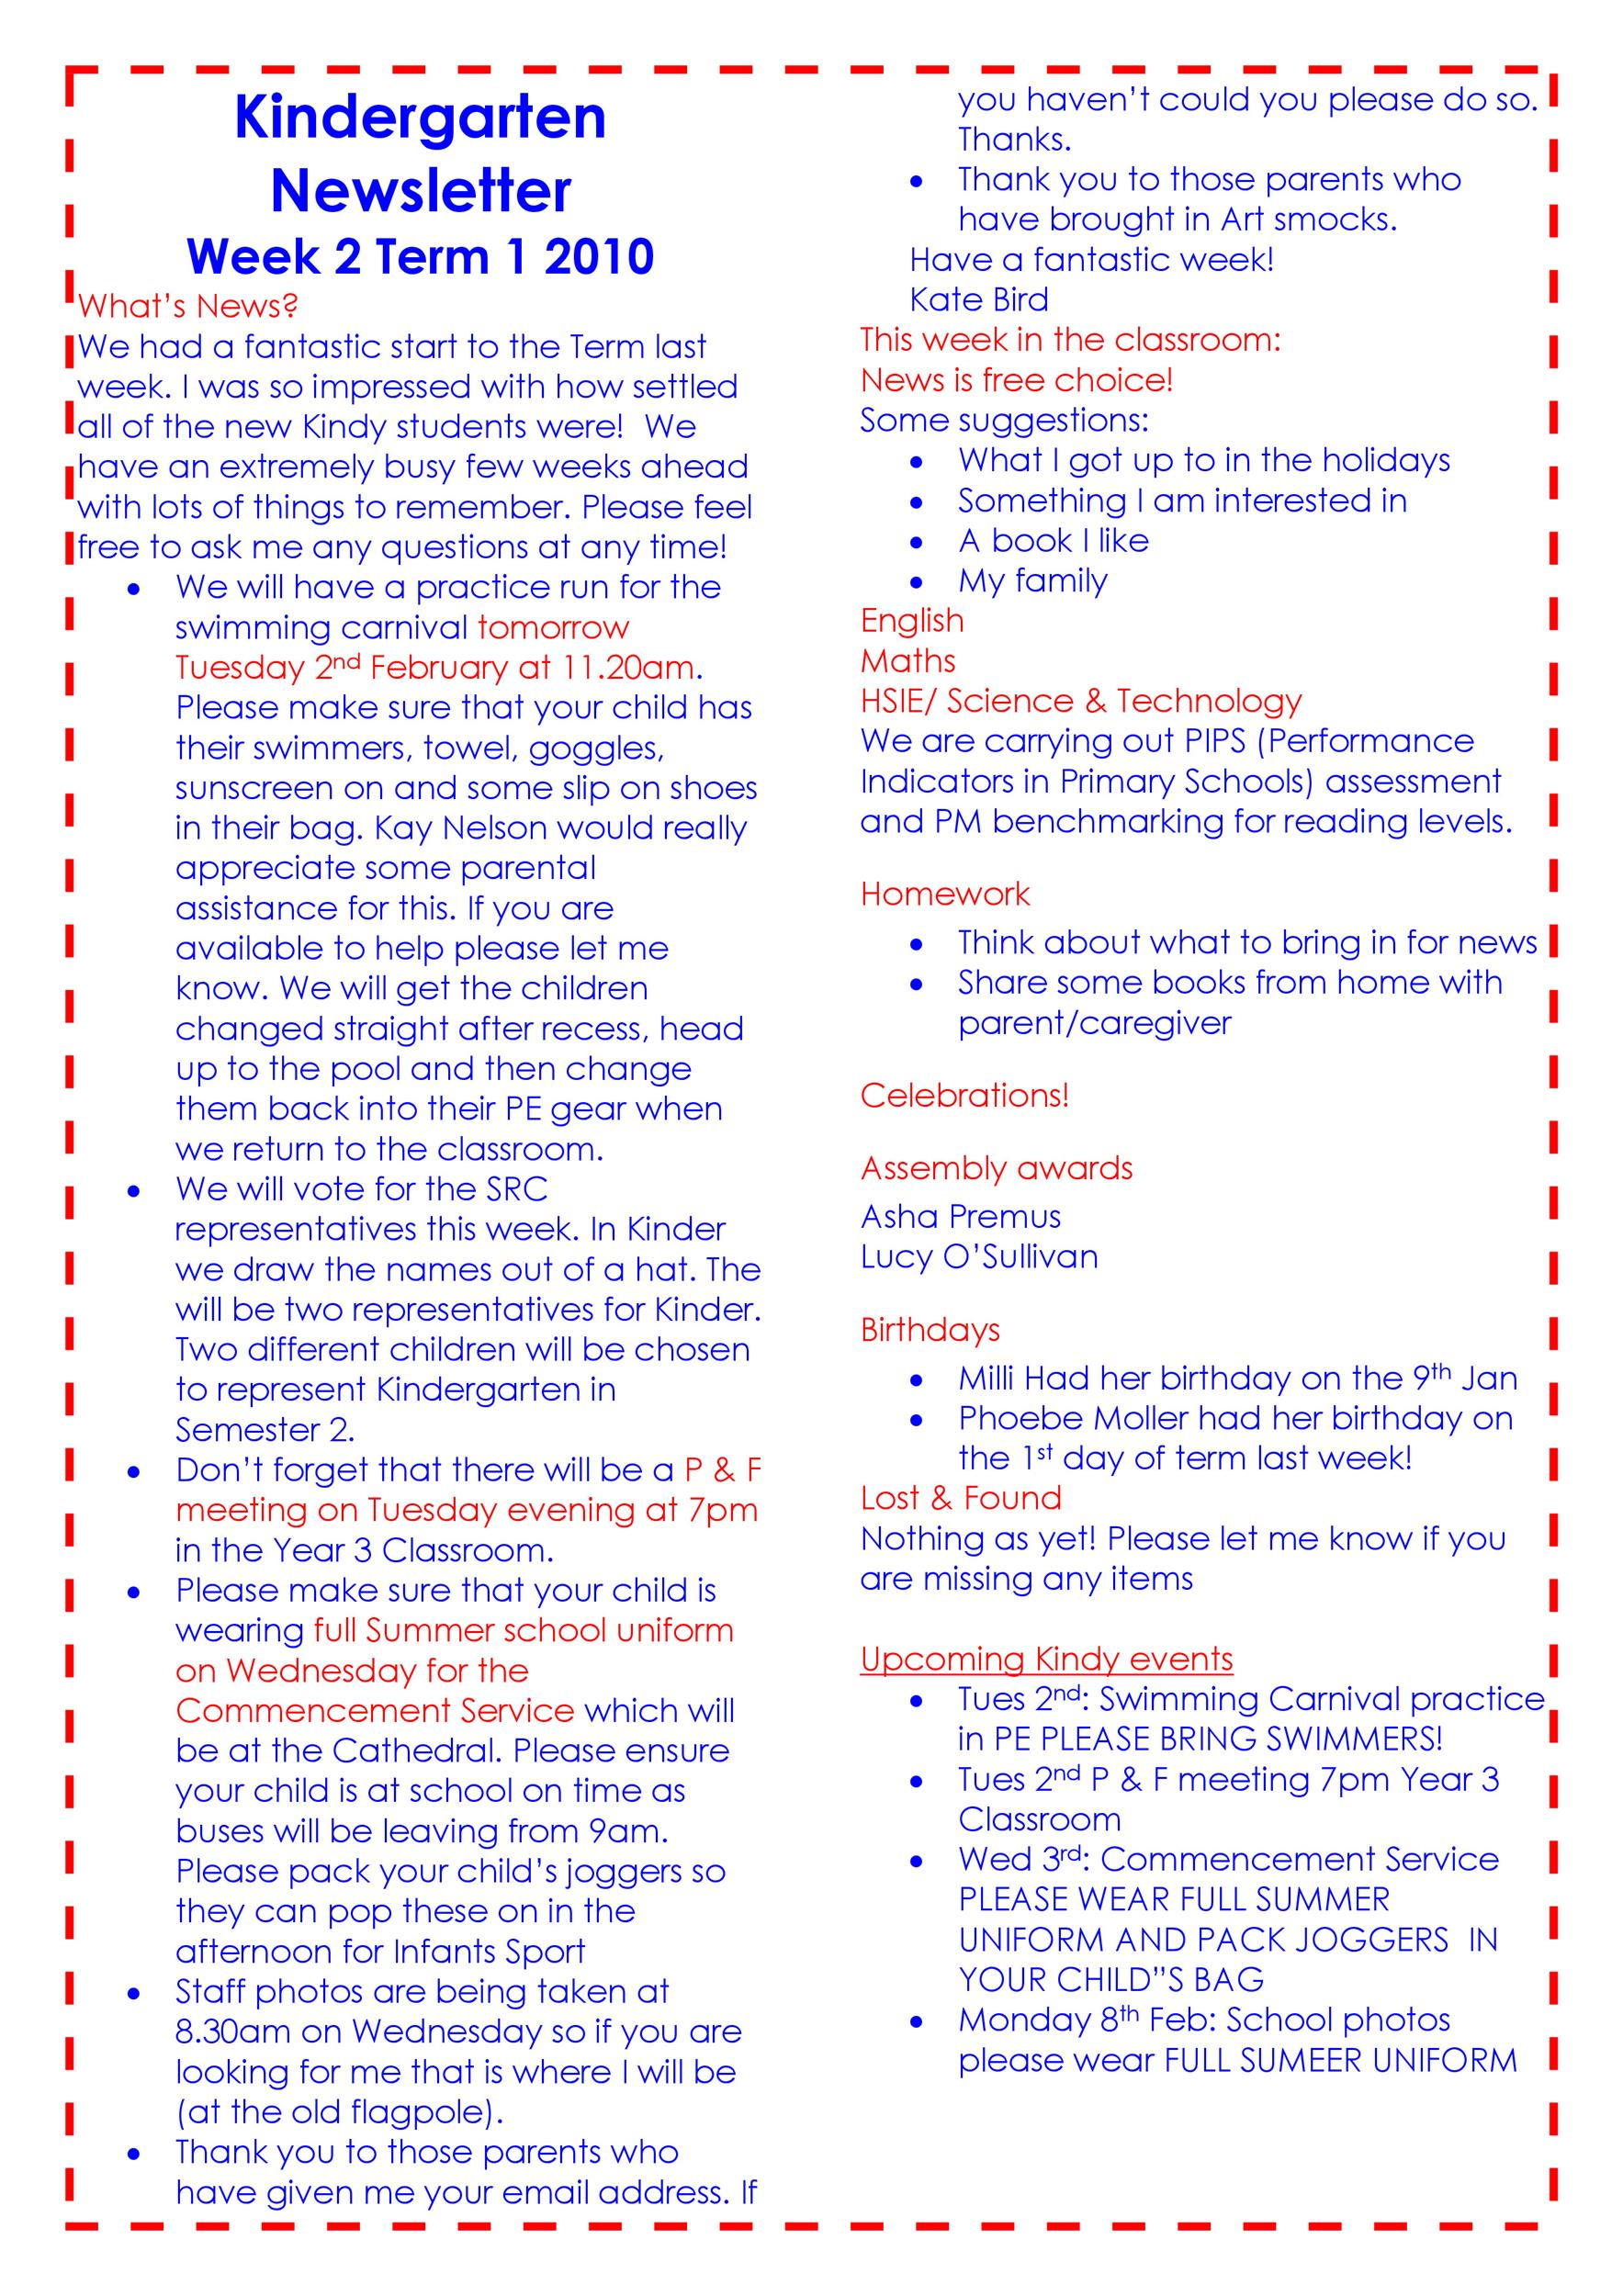 Free preschool newsletter template 45